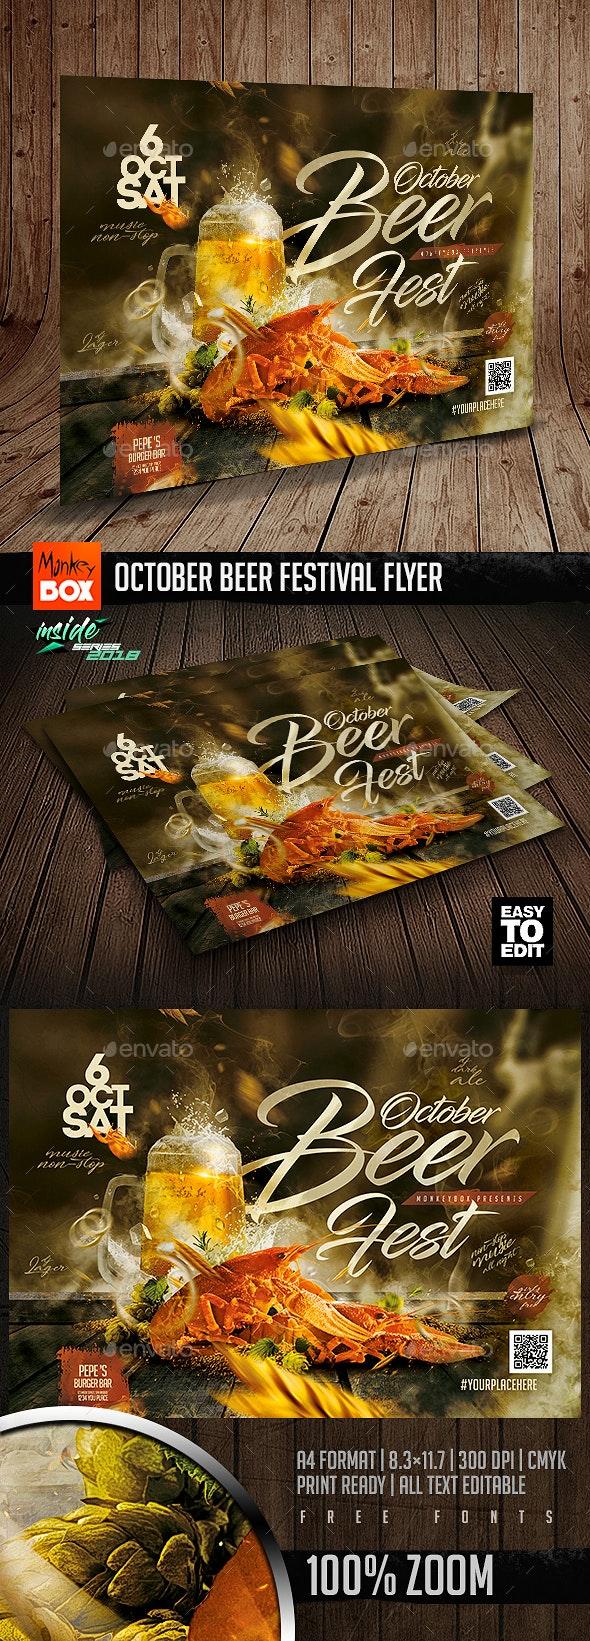 October Beer Festival Flyer - Restaurant Flyers